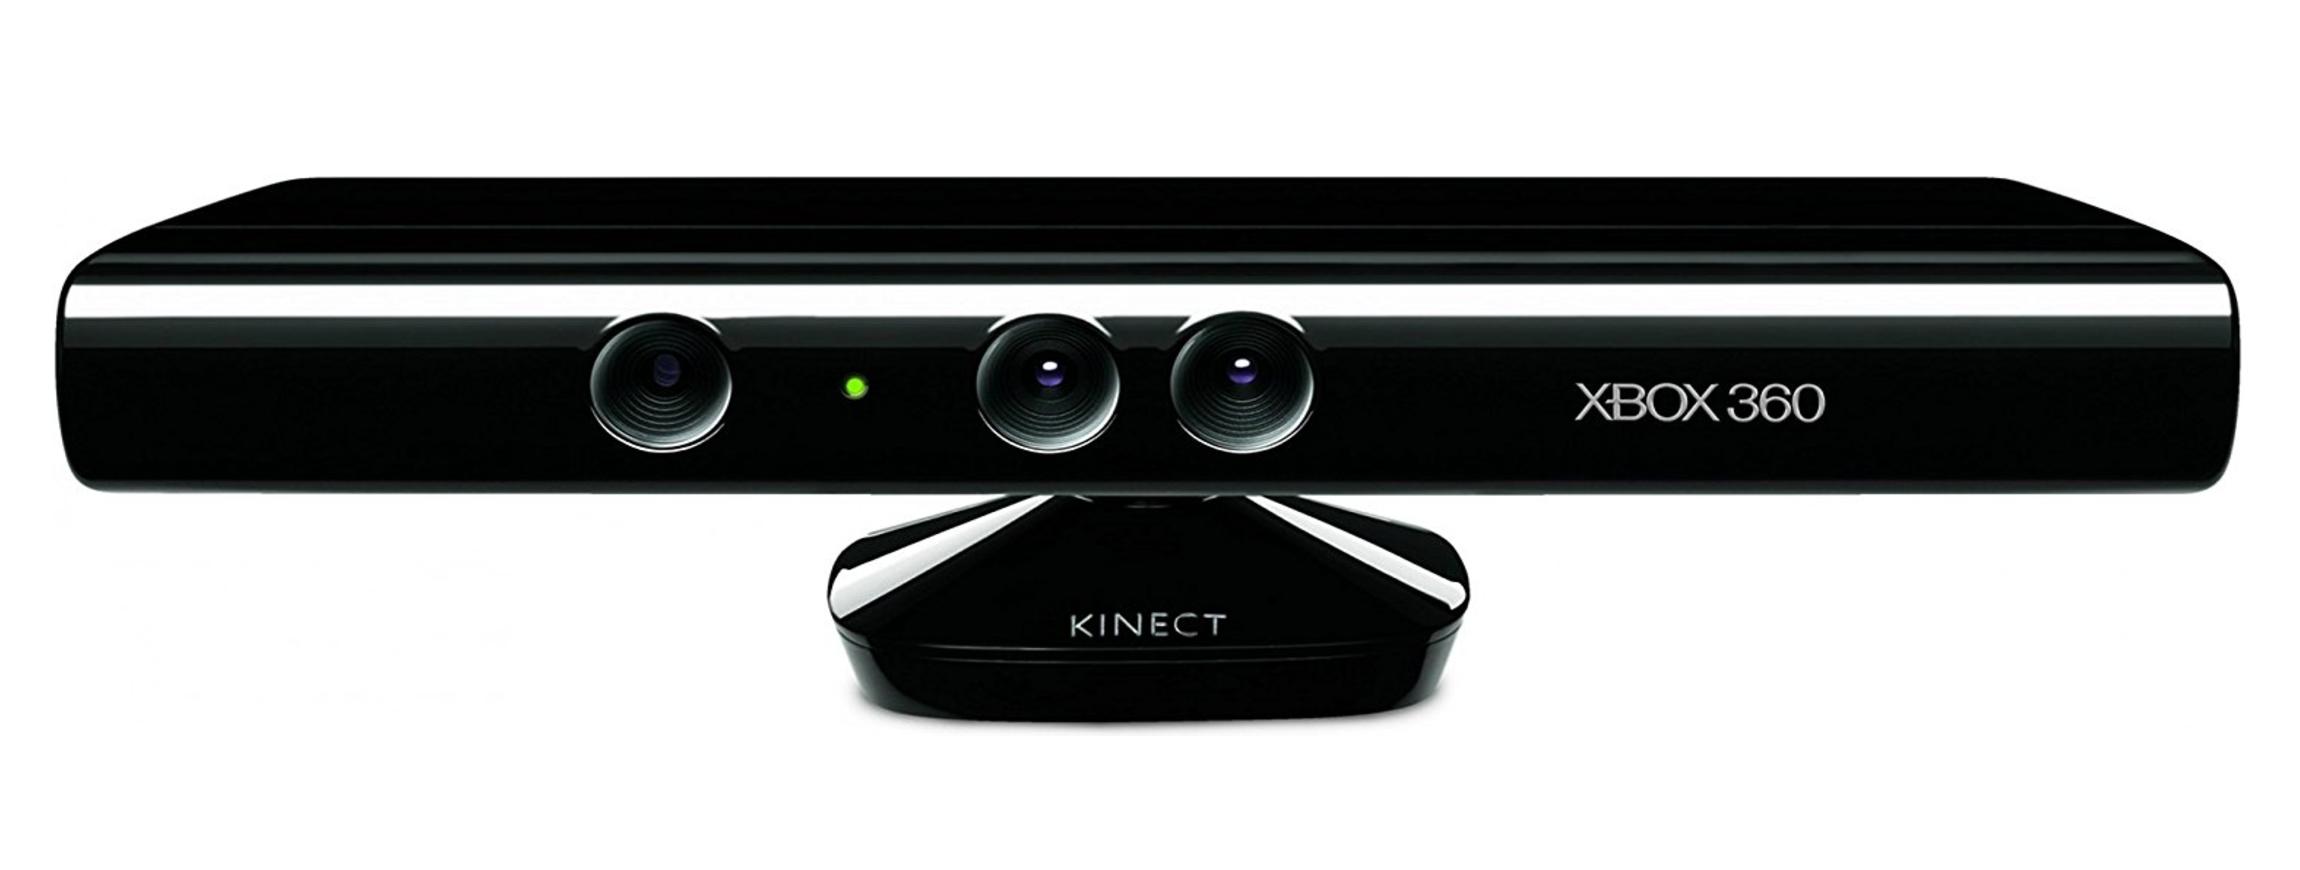 xbox 360 kinect microsoft